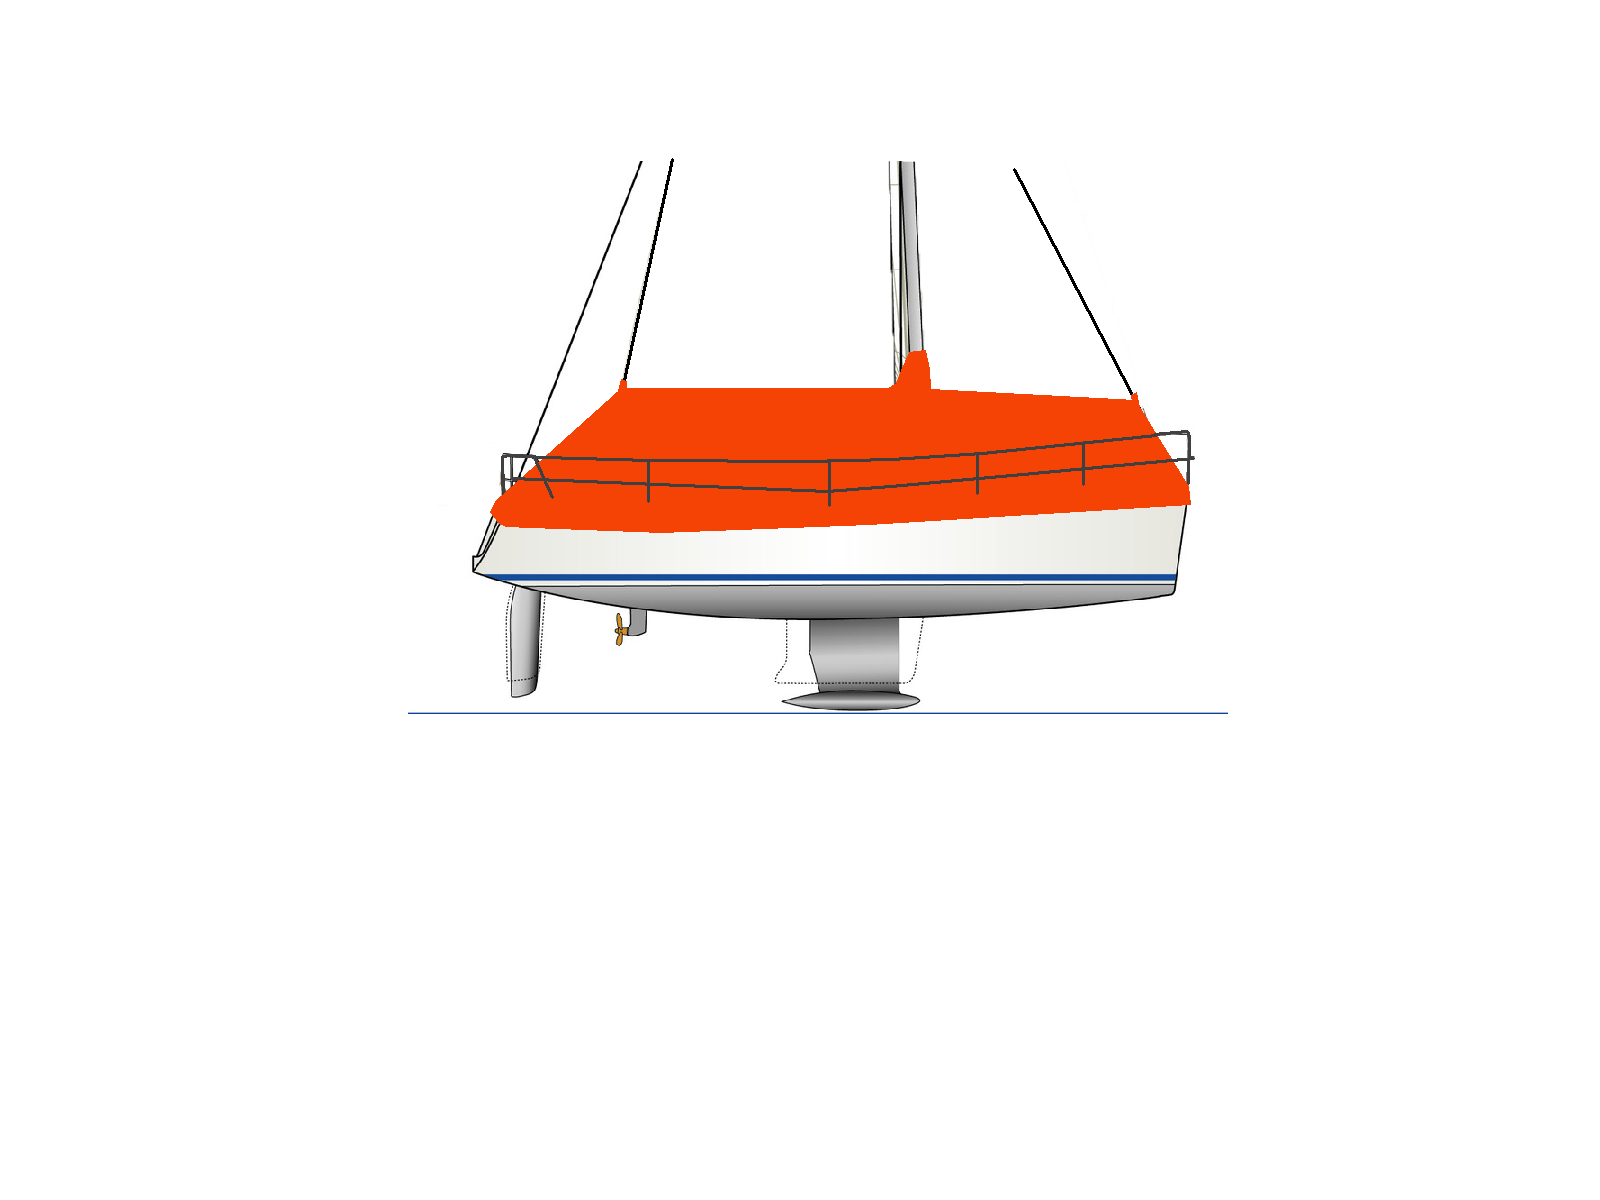 01 03 Typ C Segelboot GP unter Reling.PNG